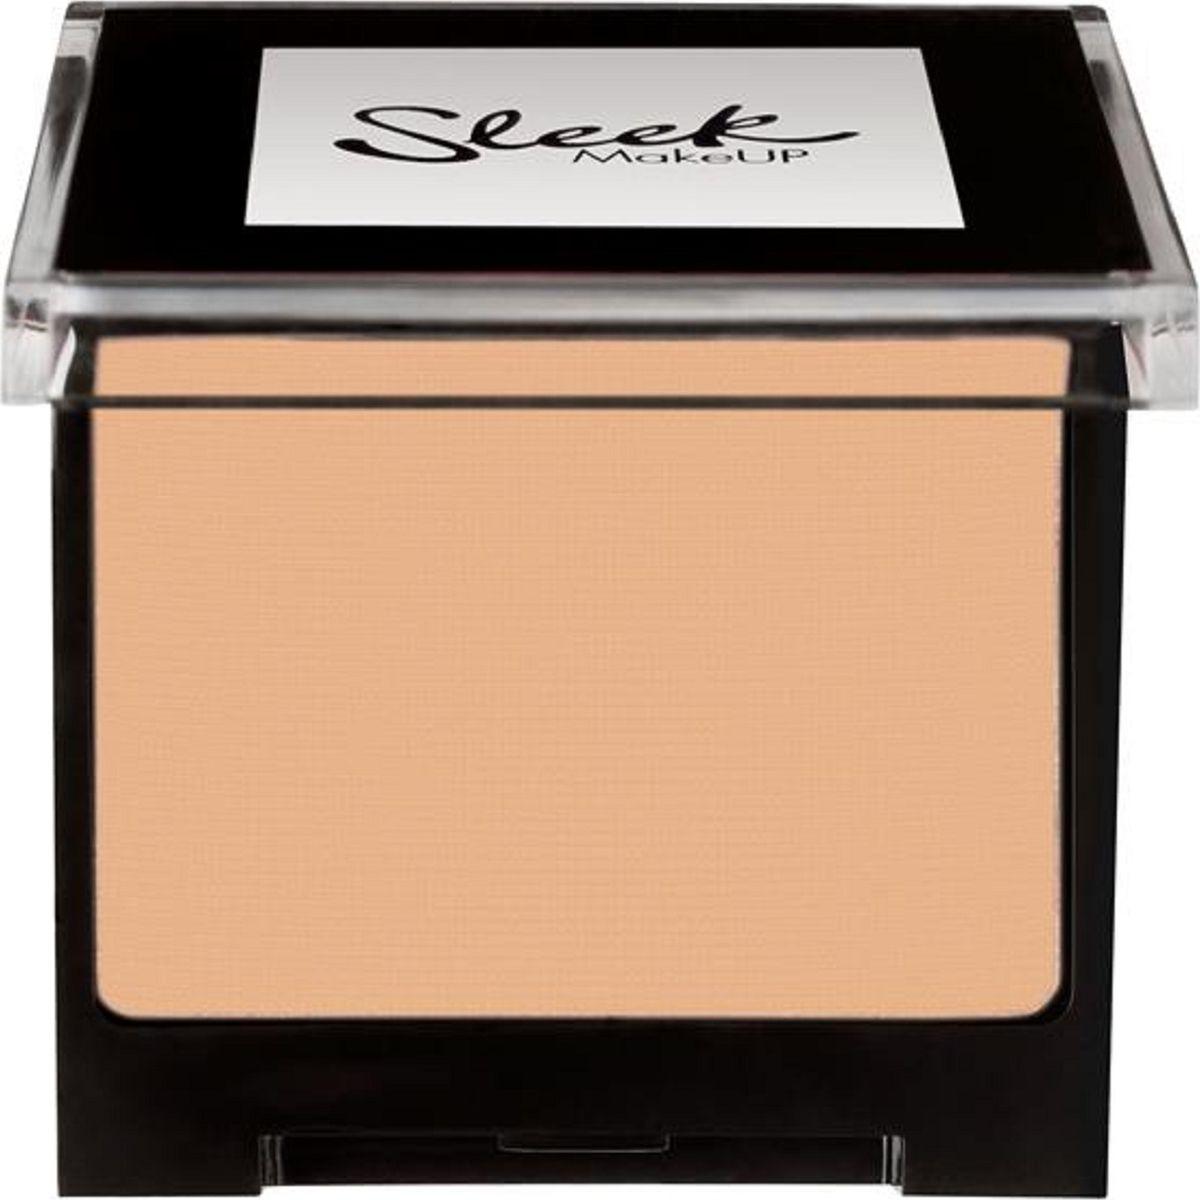 Тени для век Sleek MakeUP Mono Eyeshadow Back to Reality 1268, 11,5 г все цены